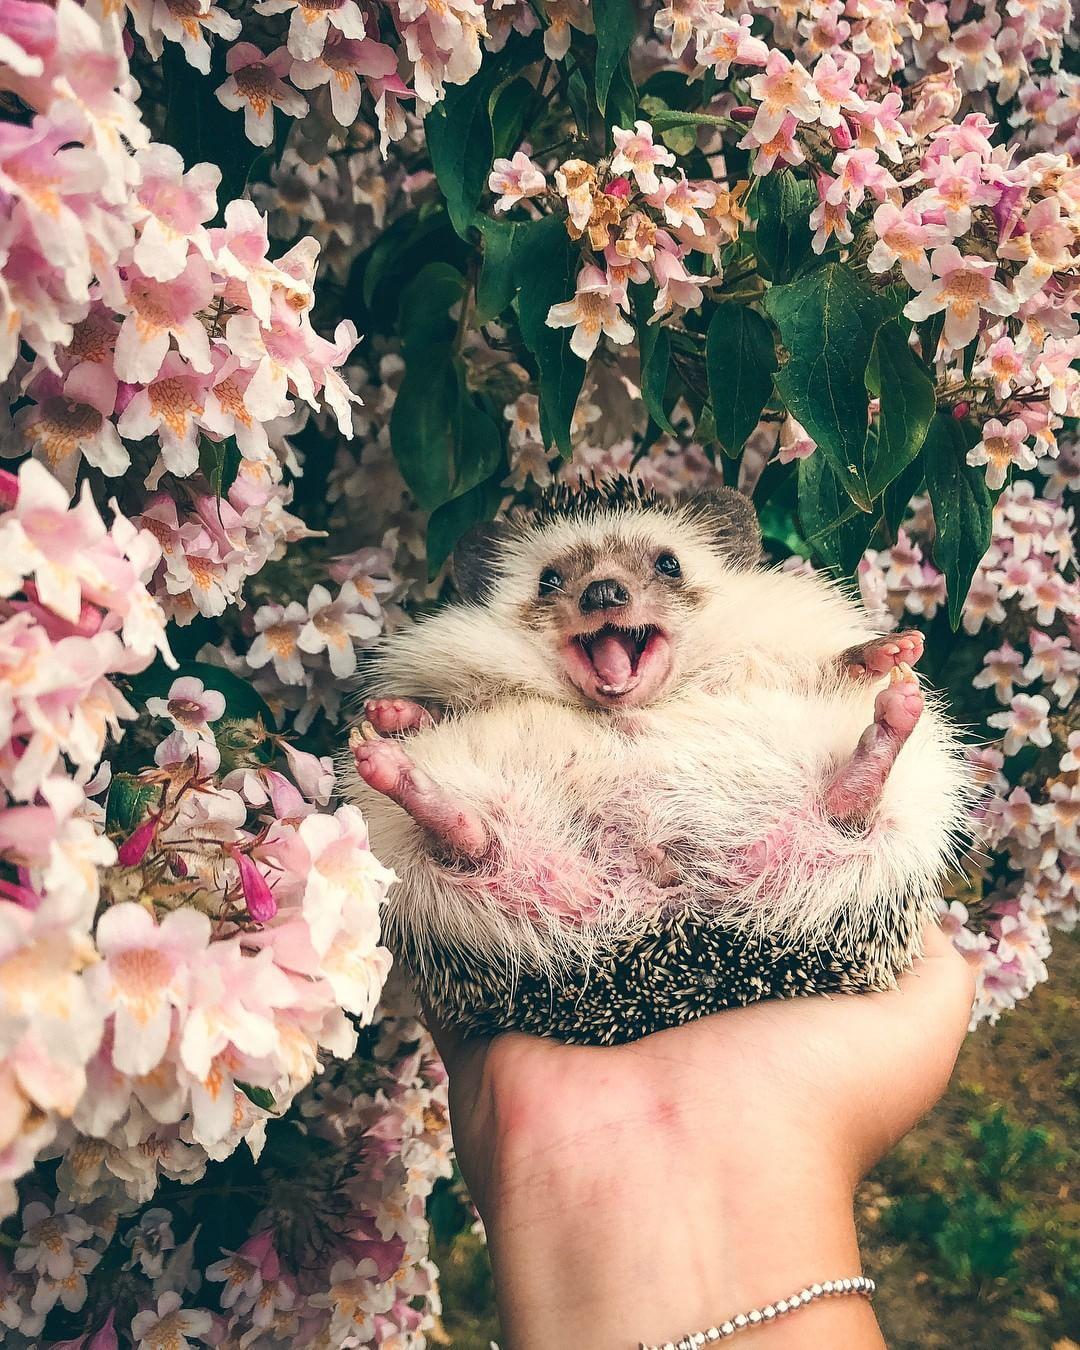 Mr Pokee Having The Best Time Hedgehog Hedgehogs Animals Ohhdeer Cuteanimals Cute Funny Animals Cute Baby Animals Baby Animals Pictures